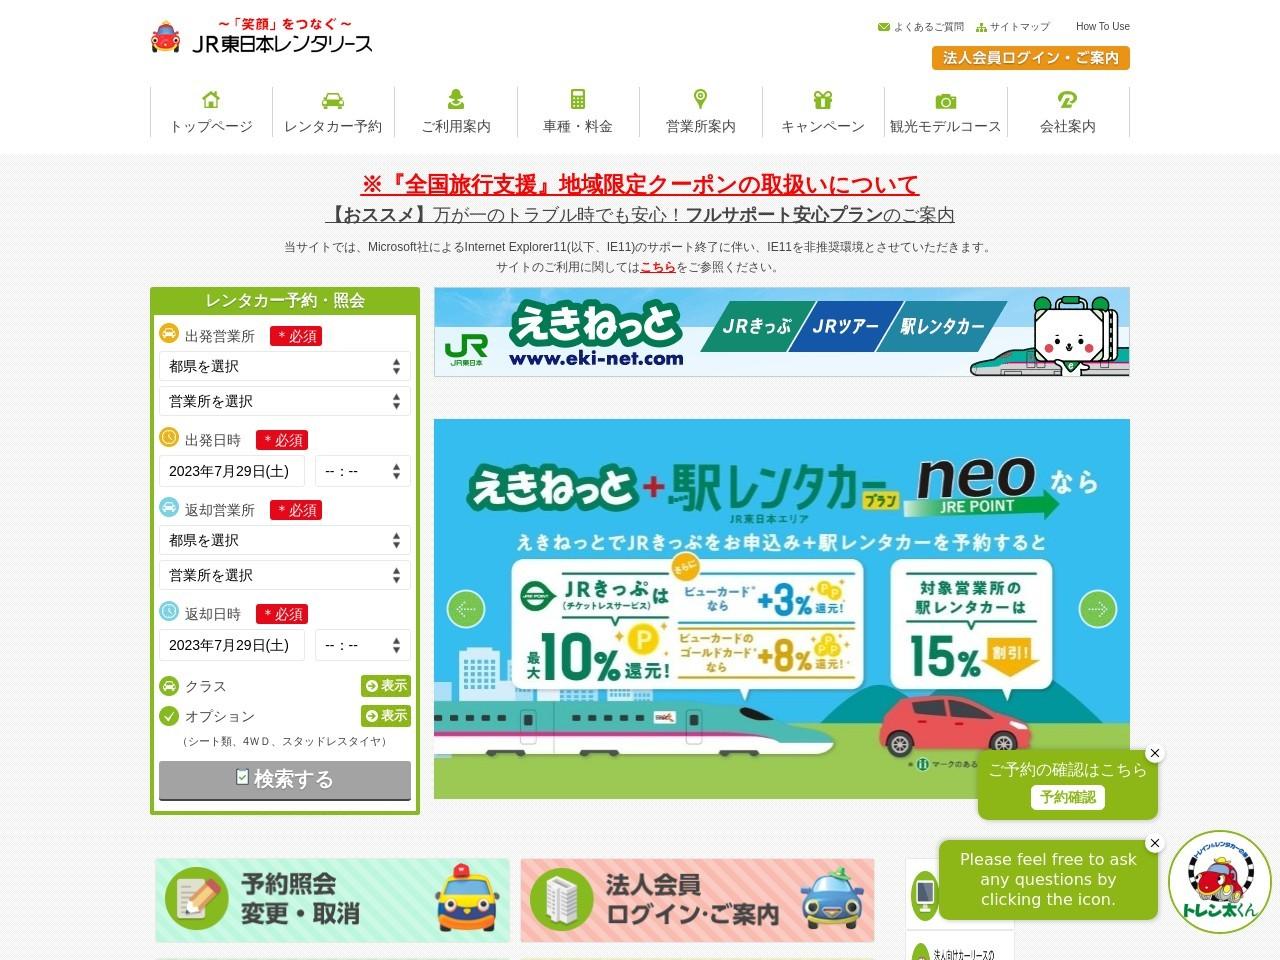 JR東日本レンタリース株式会社/本社